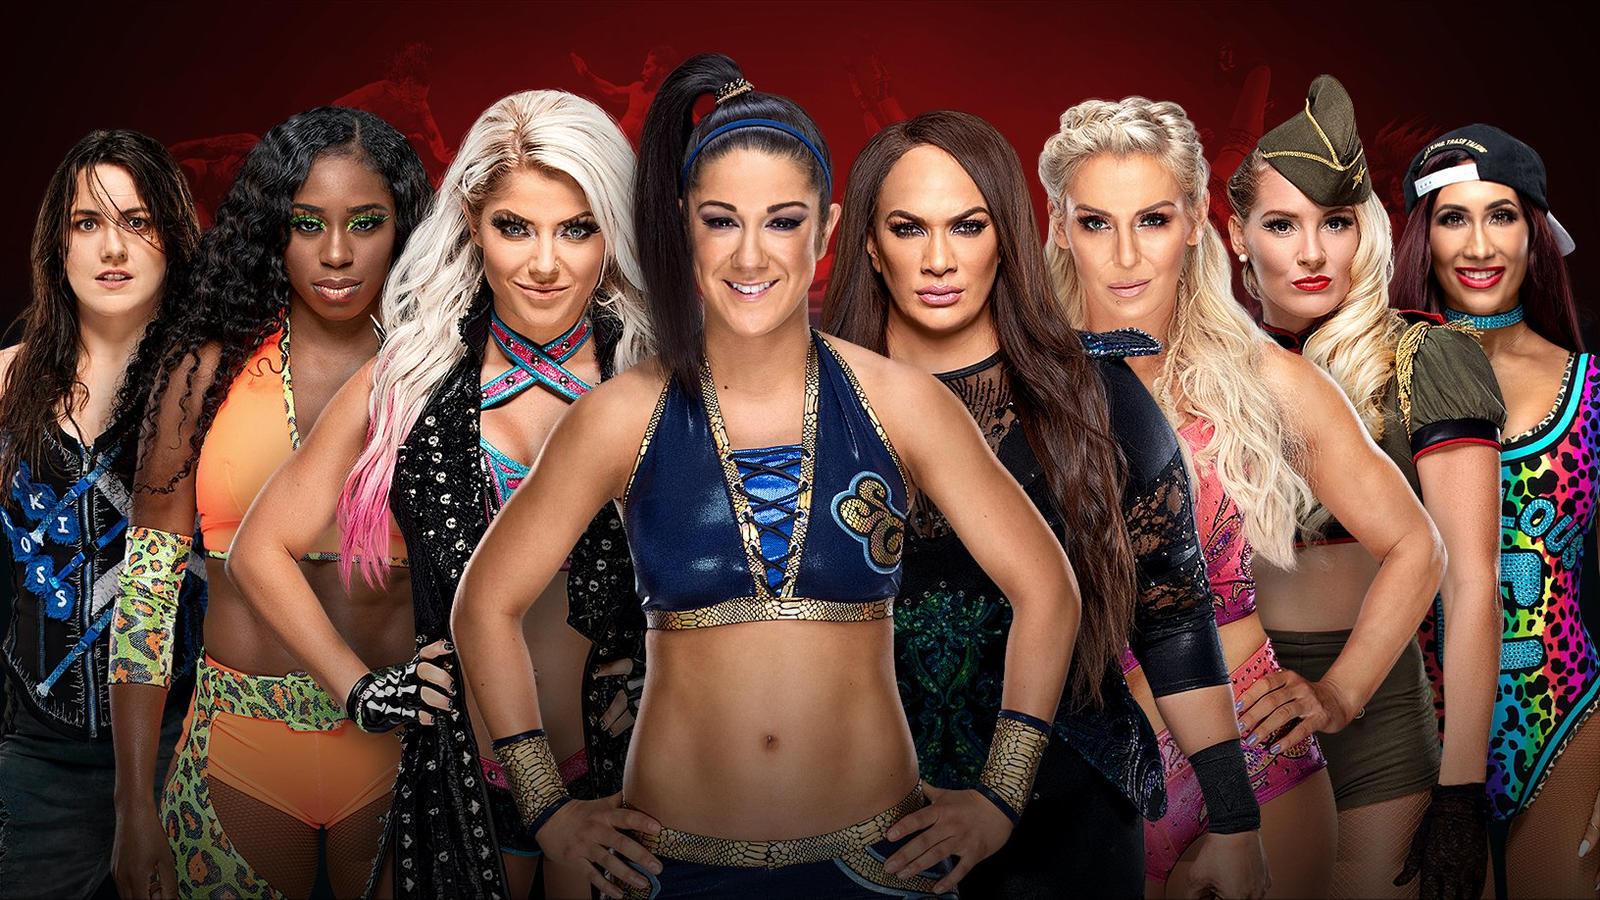 2019 Women's Royal Rumble Match